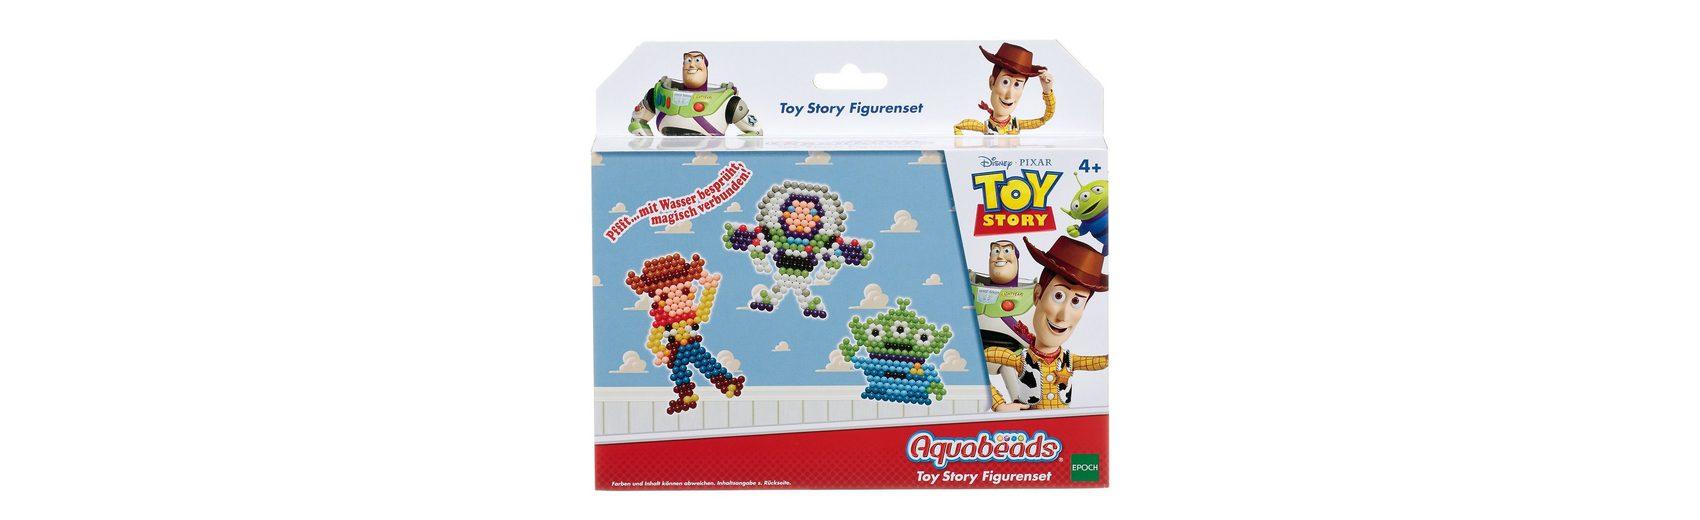 Epoch Traumwiesen Aquabeads Toy Story Figurenset